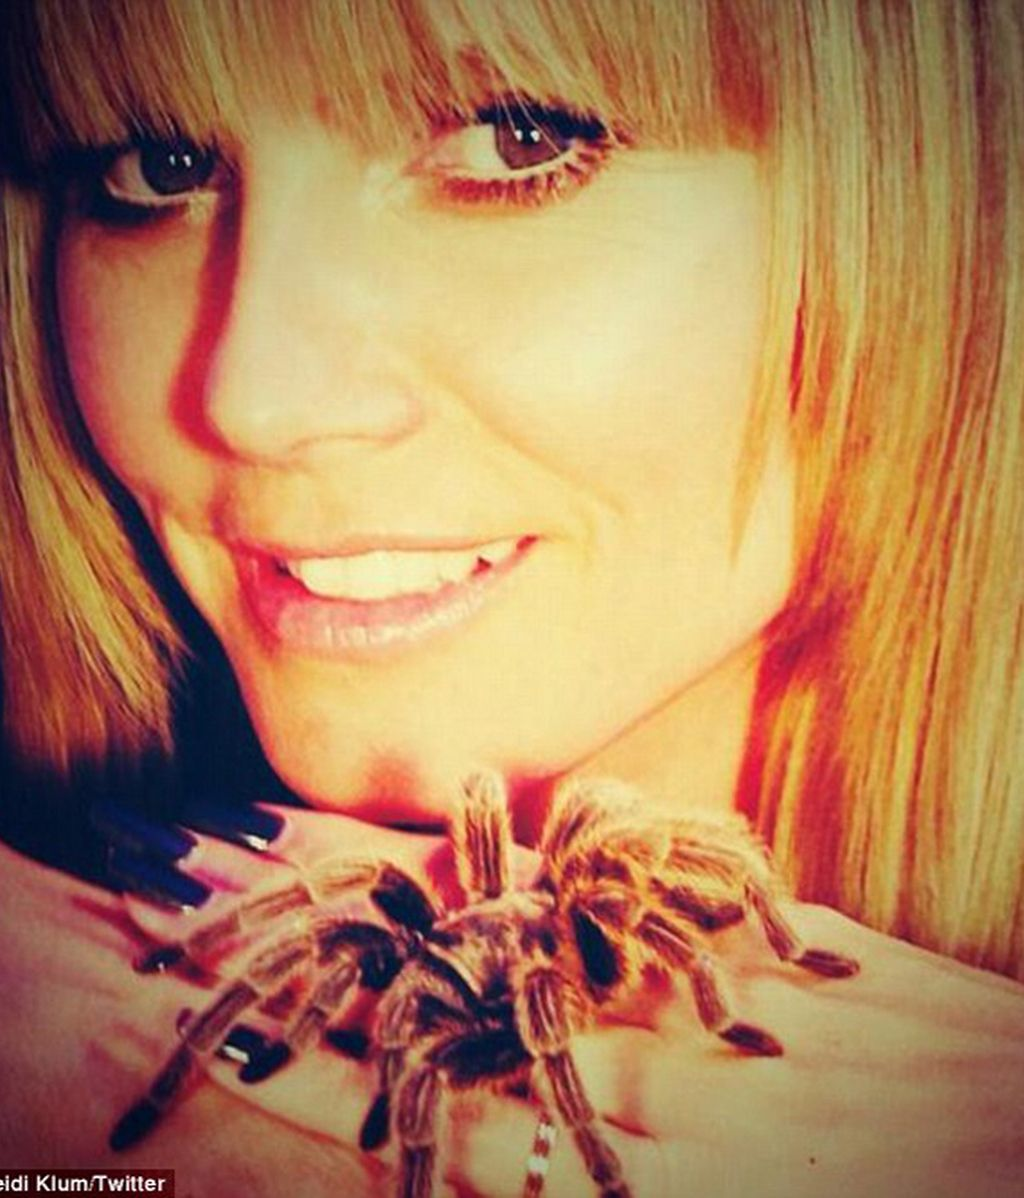 A Heidi Klum no le asustan las arañas